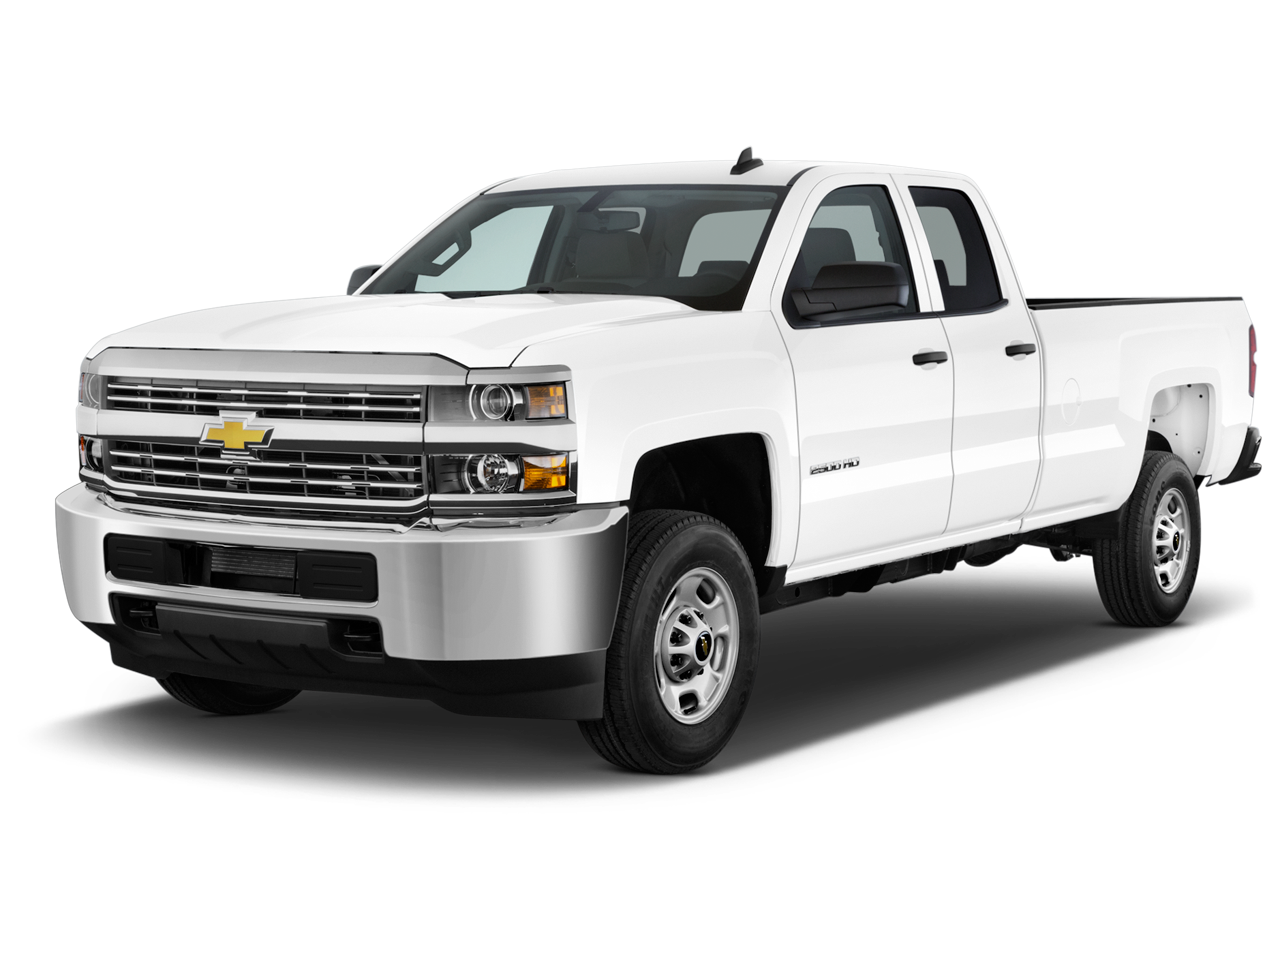 Truck chevy 2500 trucks : New Silverado 2500HD for Sale in Sylvania, OH - Dave White Chevrolet